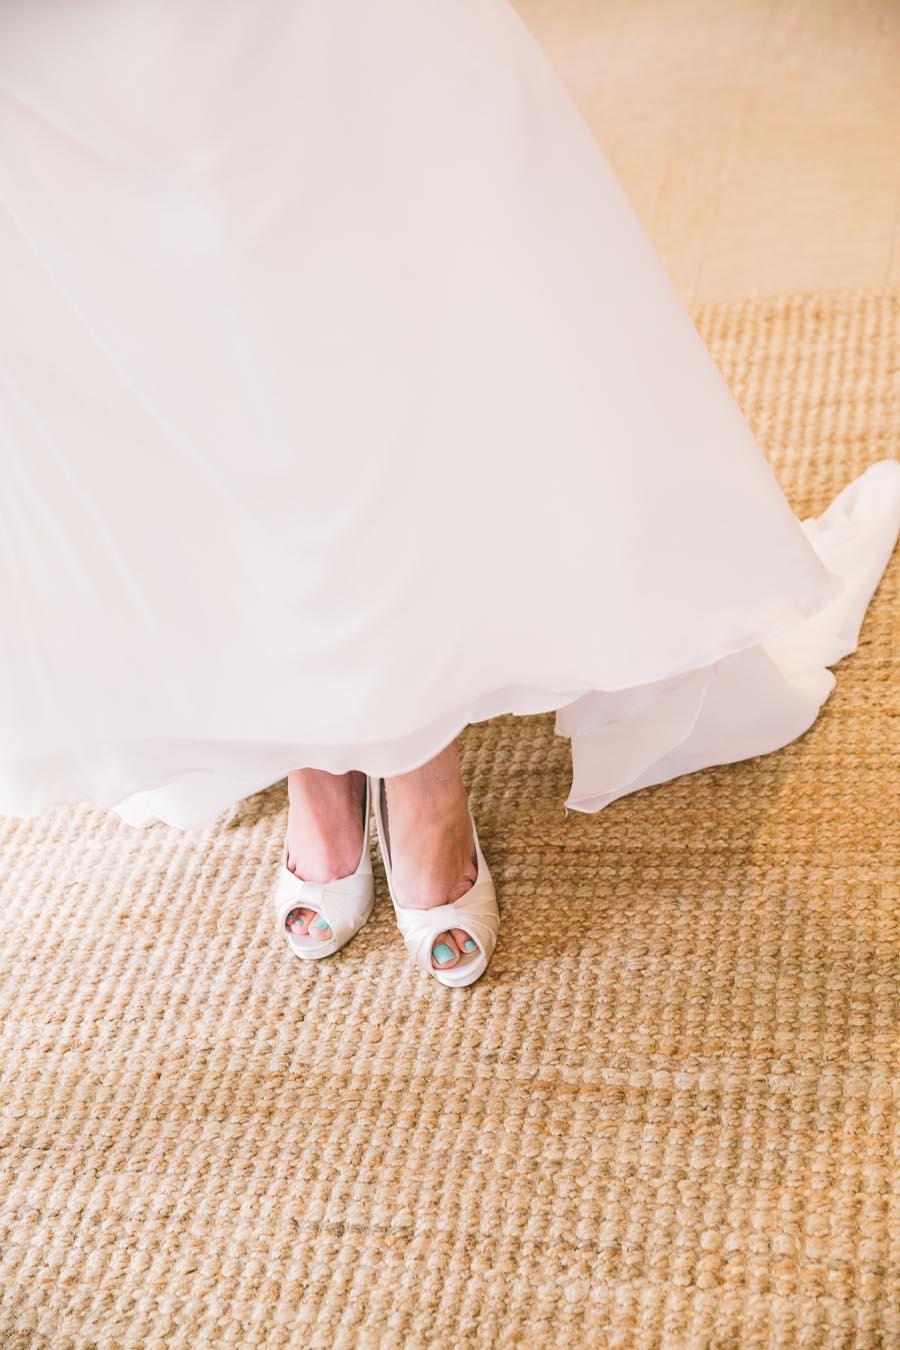 north-olmstead-wedding-photography-at-rubys-grafton-44.jpg